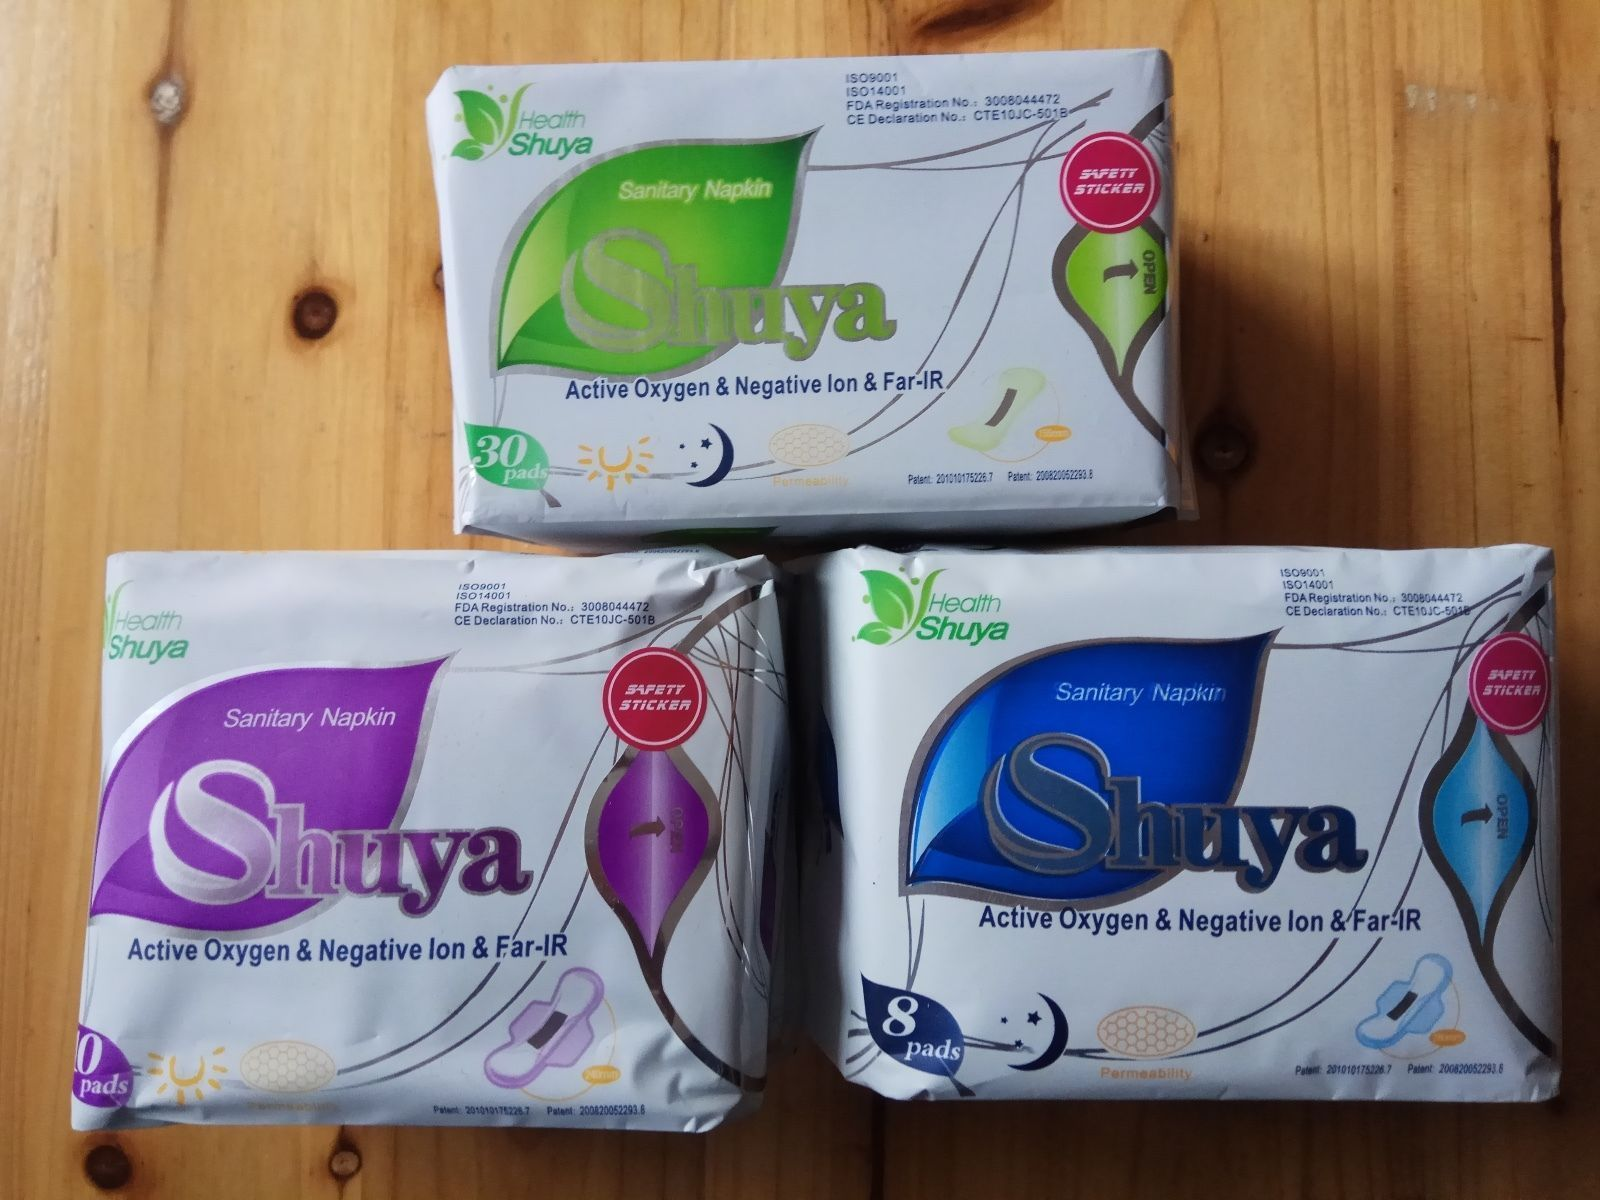 Hot~Shuya Organic Cotton Anion Sanitary Napkin Day Use+Nigh Use+Panty Liners